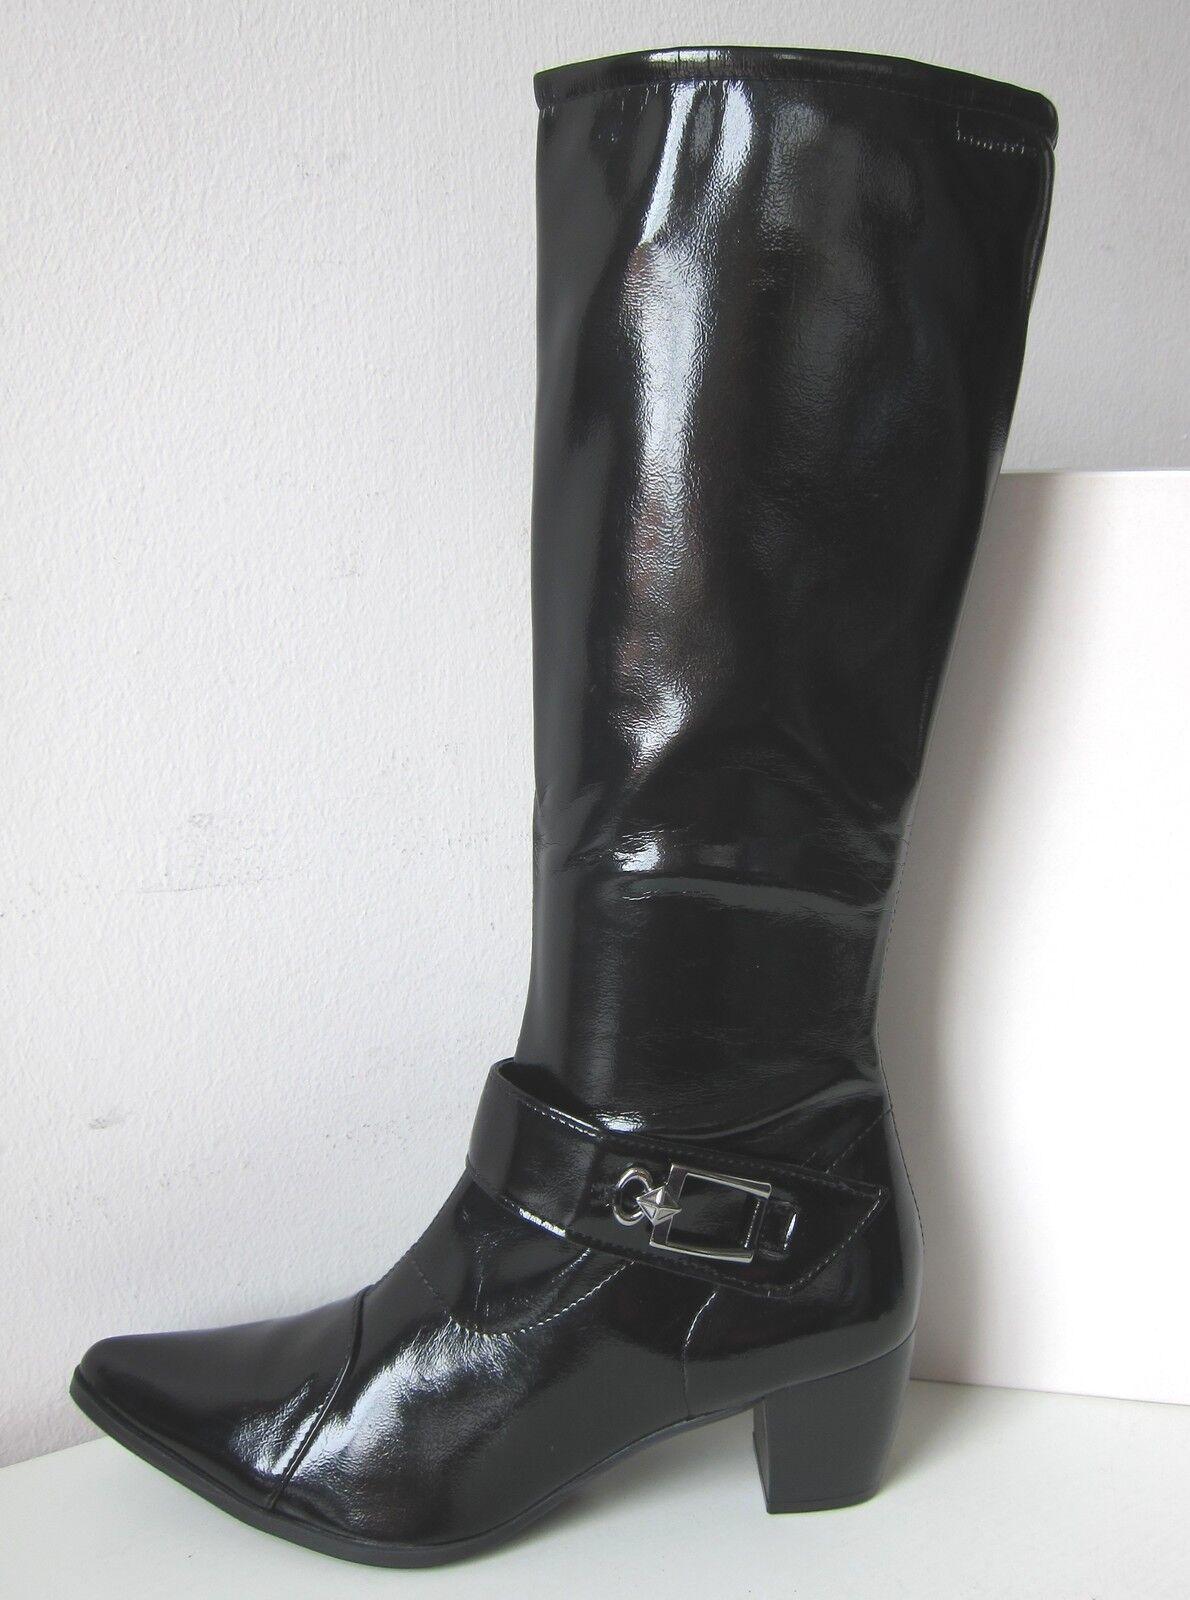 Tamaris botas botas de charol vastas XS-S negro Gr. 36 Boots patente pintura de Black